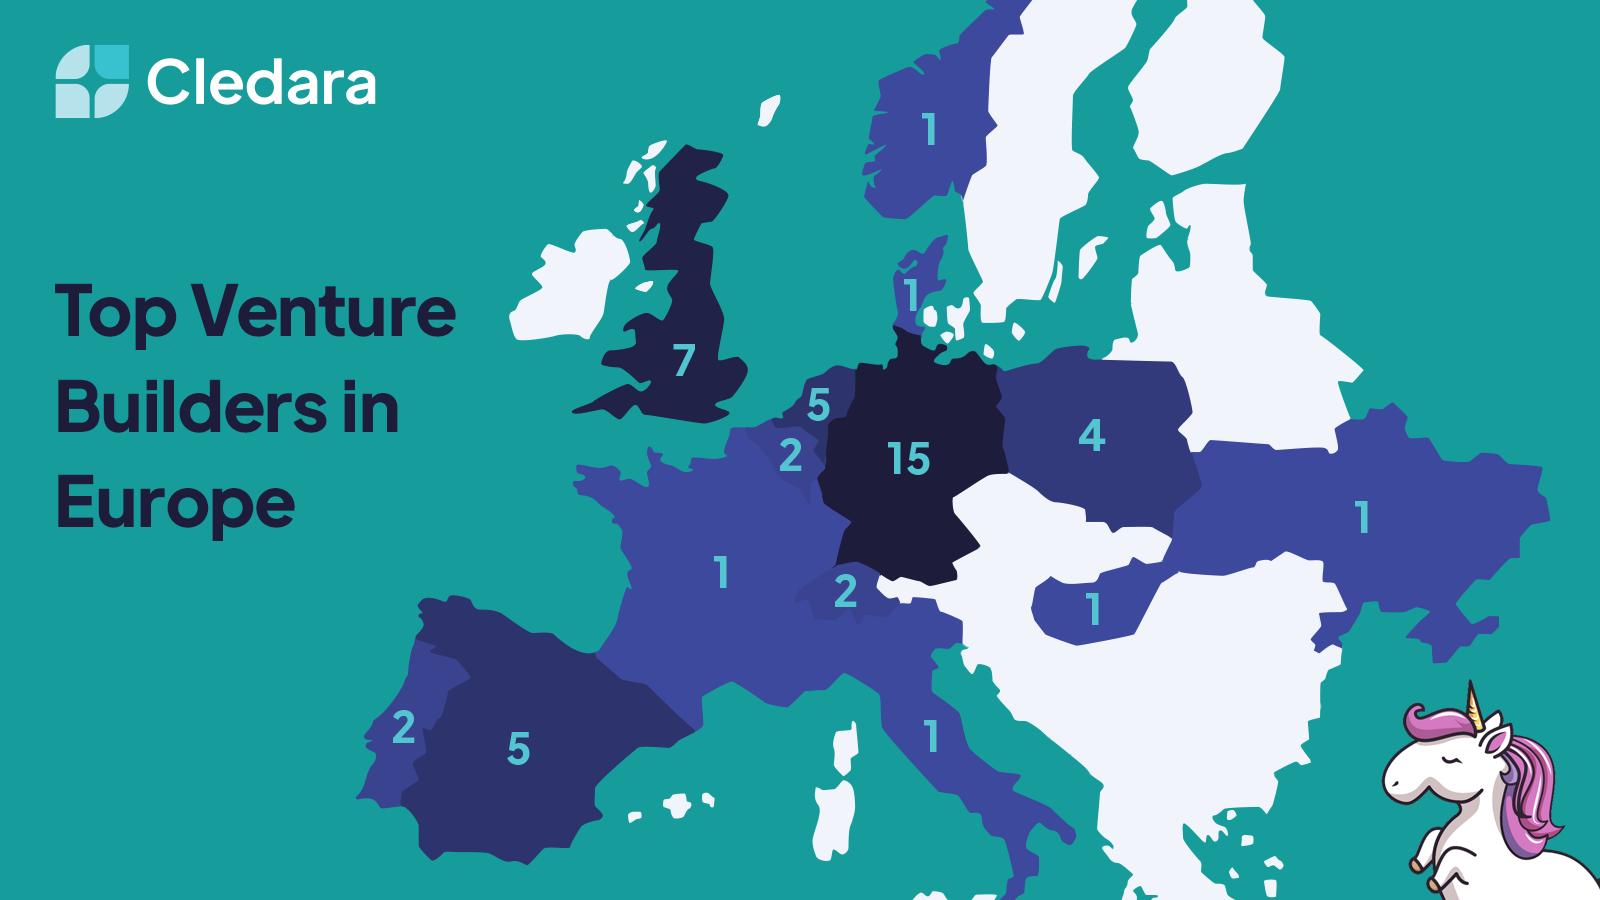 The Top 50 Venture Builders in Europe 2021